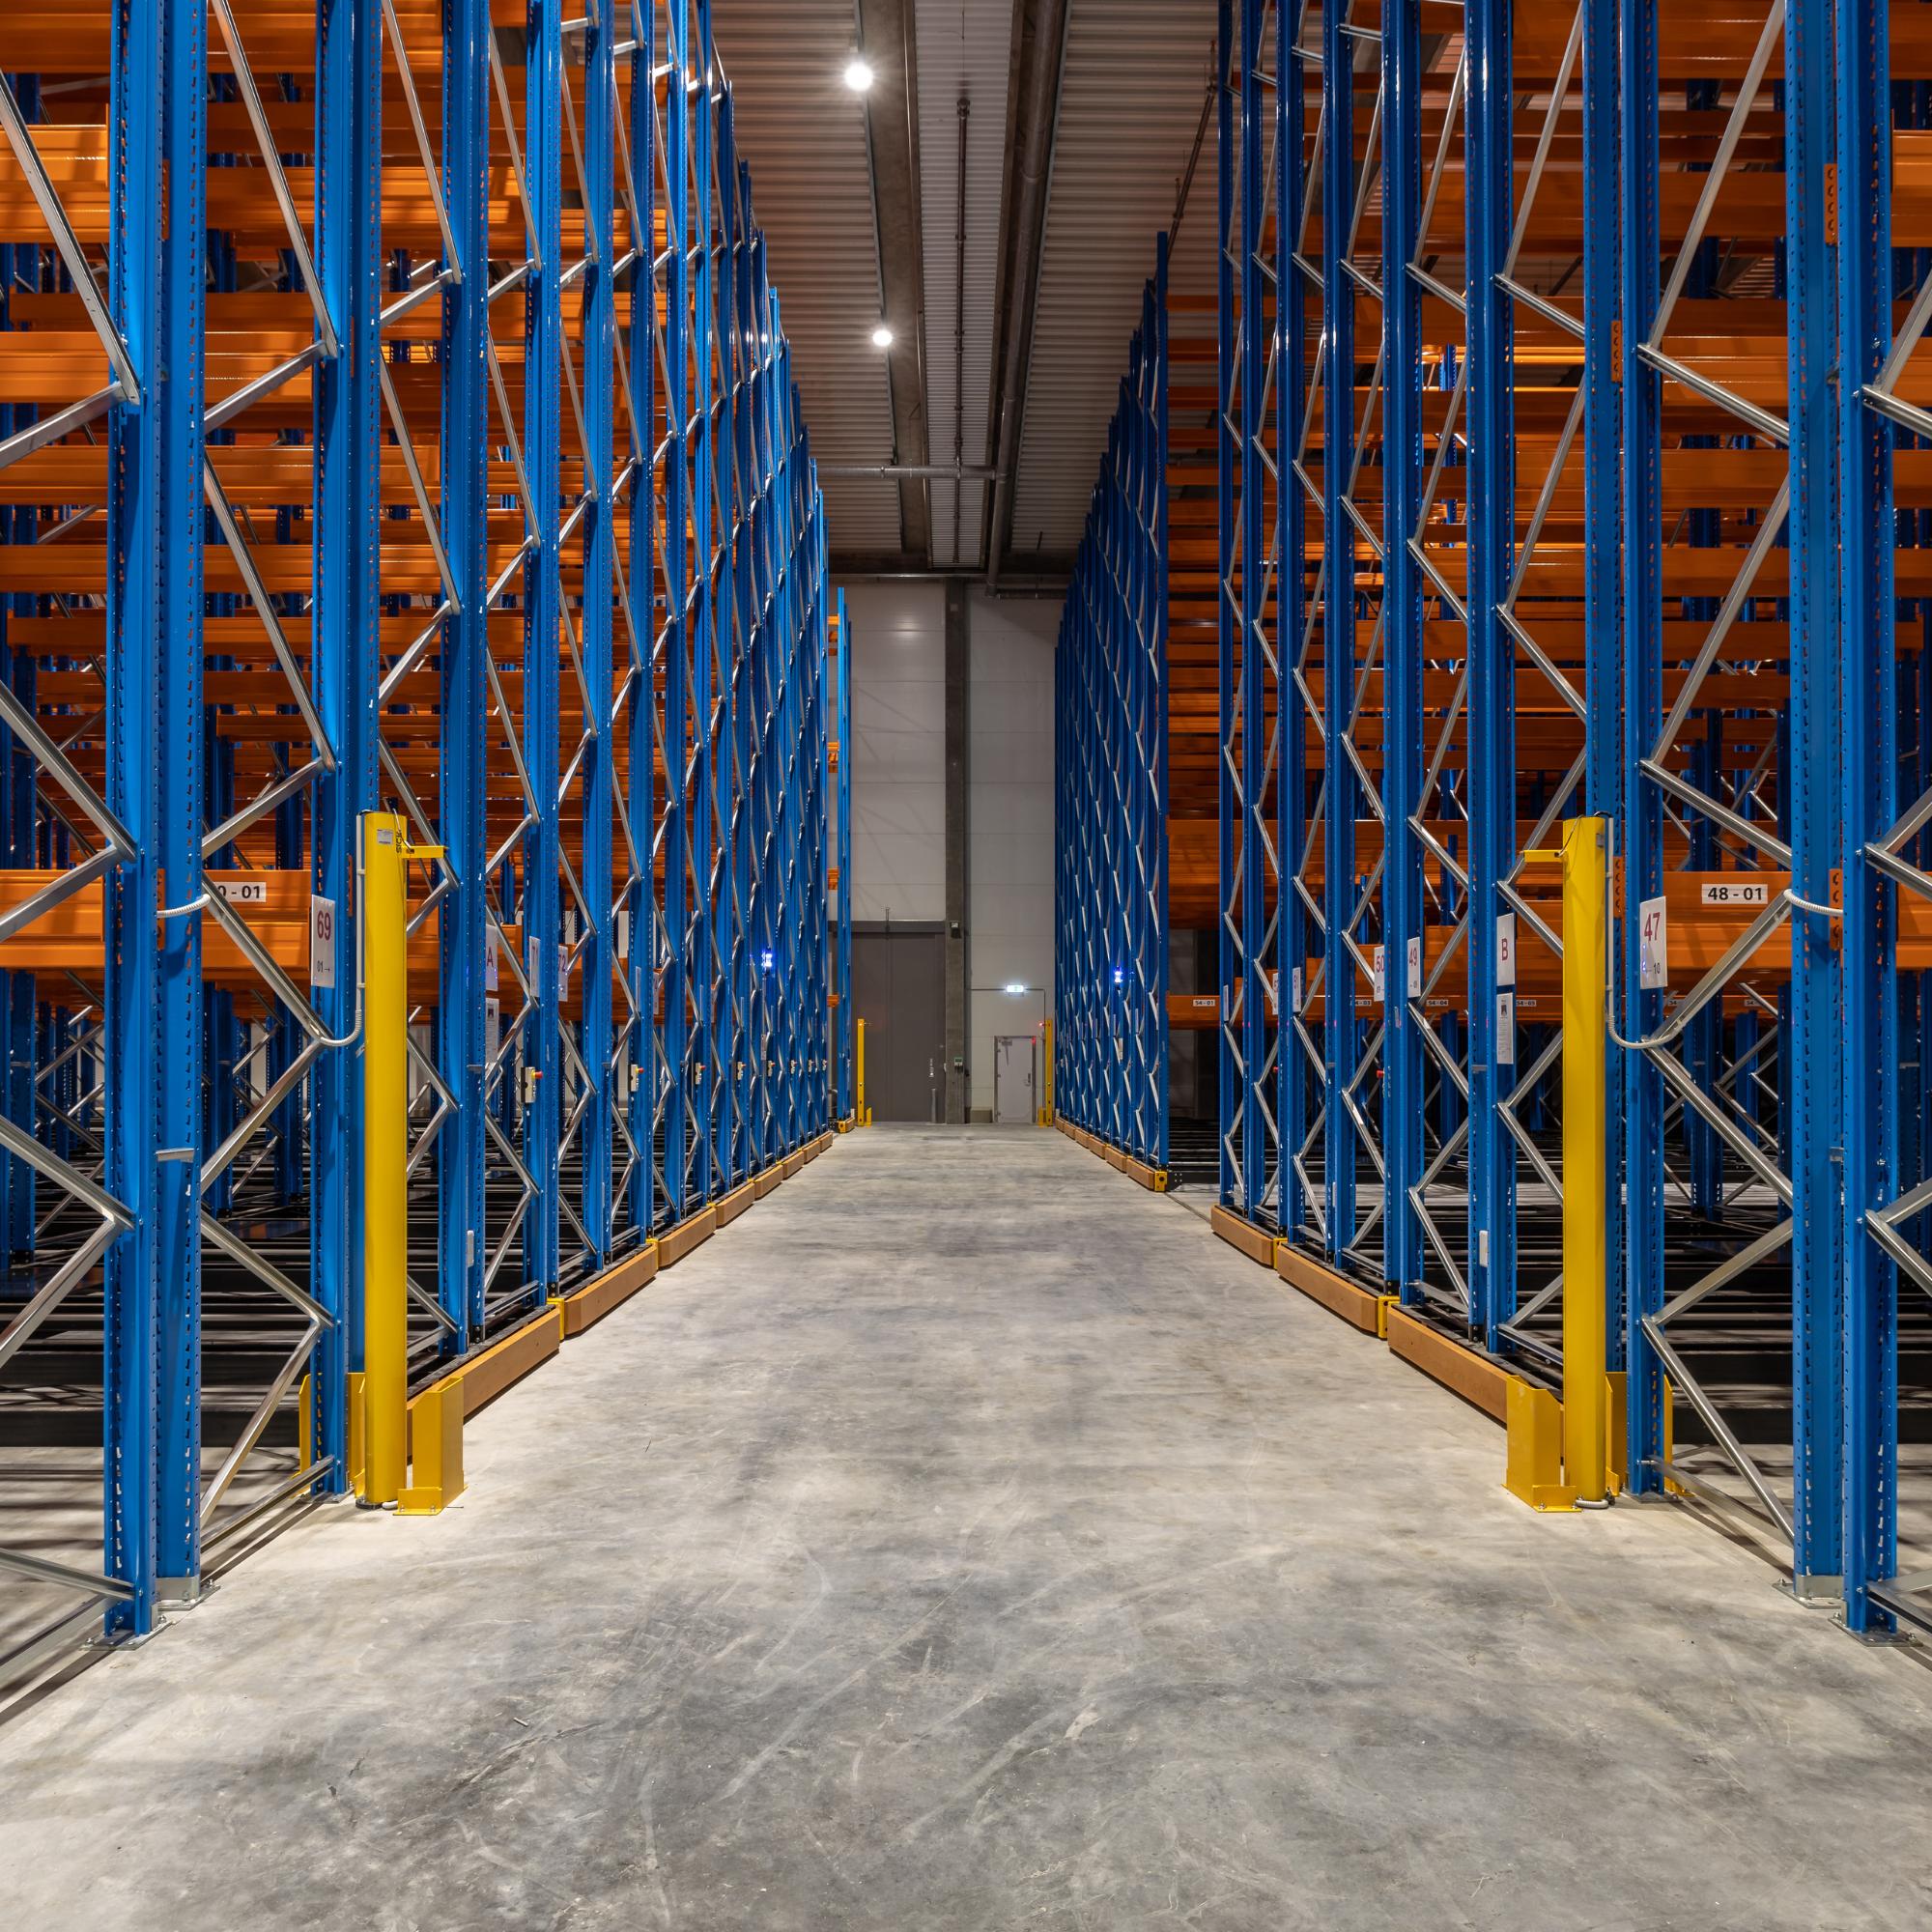 De mobile pallereoler kan rumme over 8.400 pallepladser.